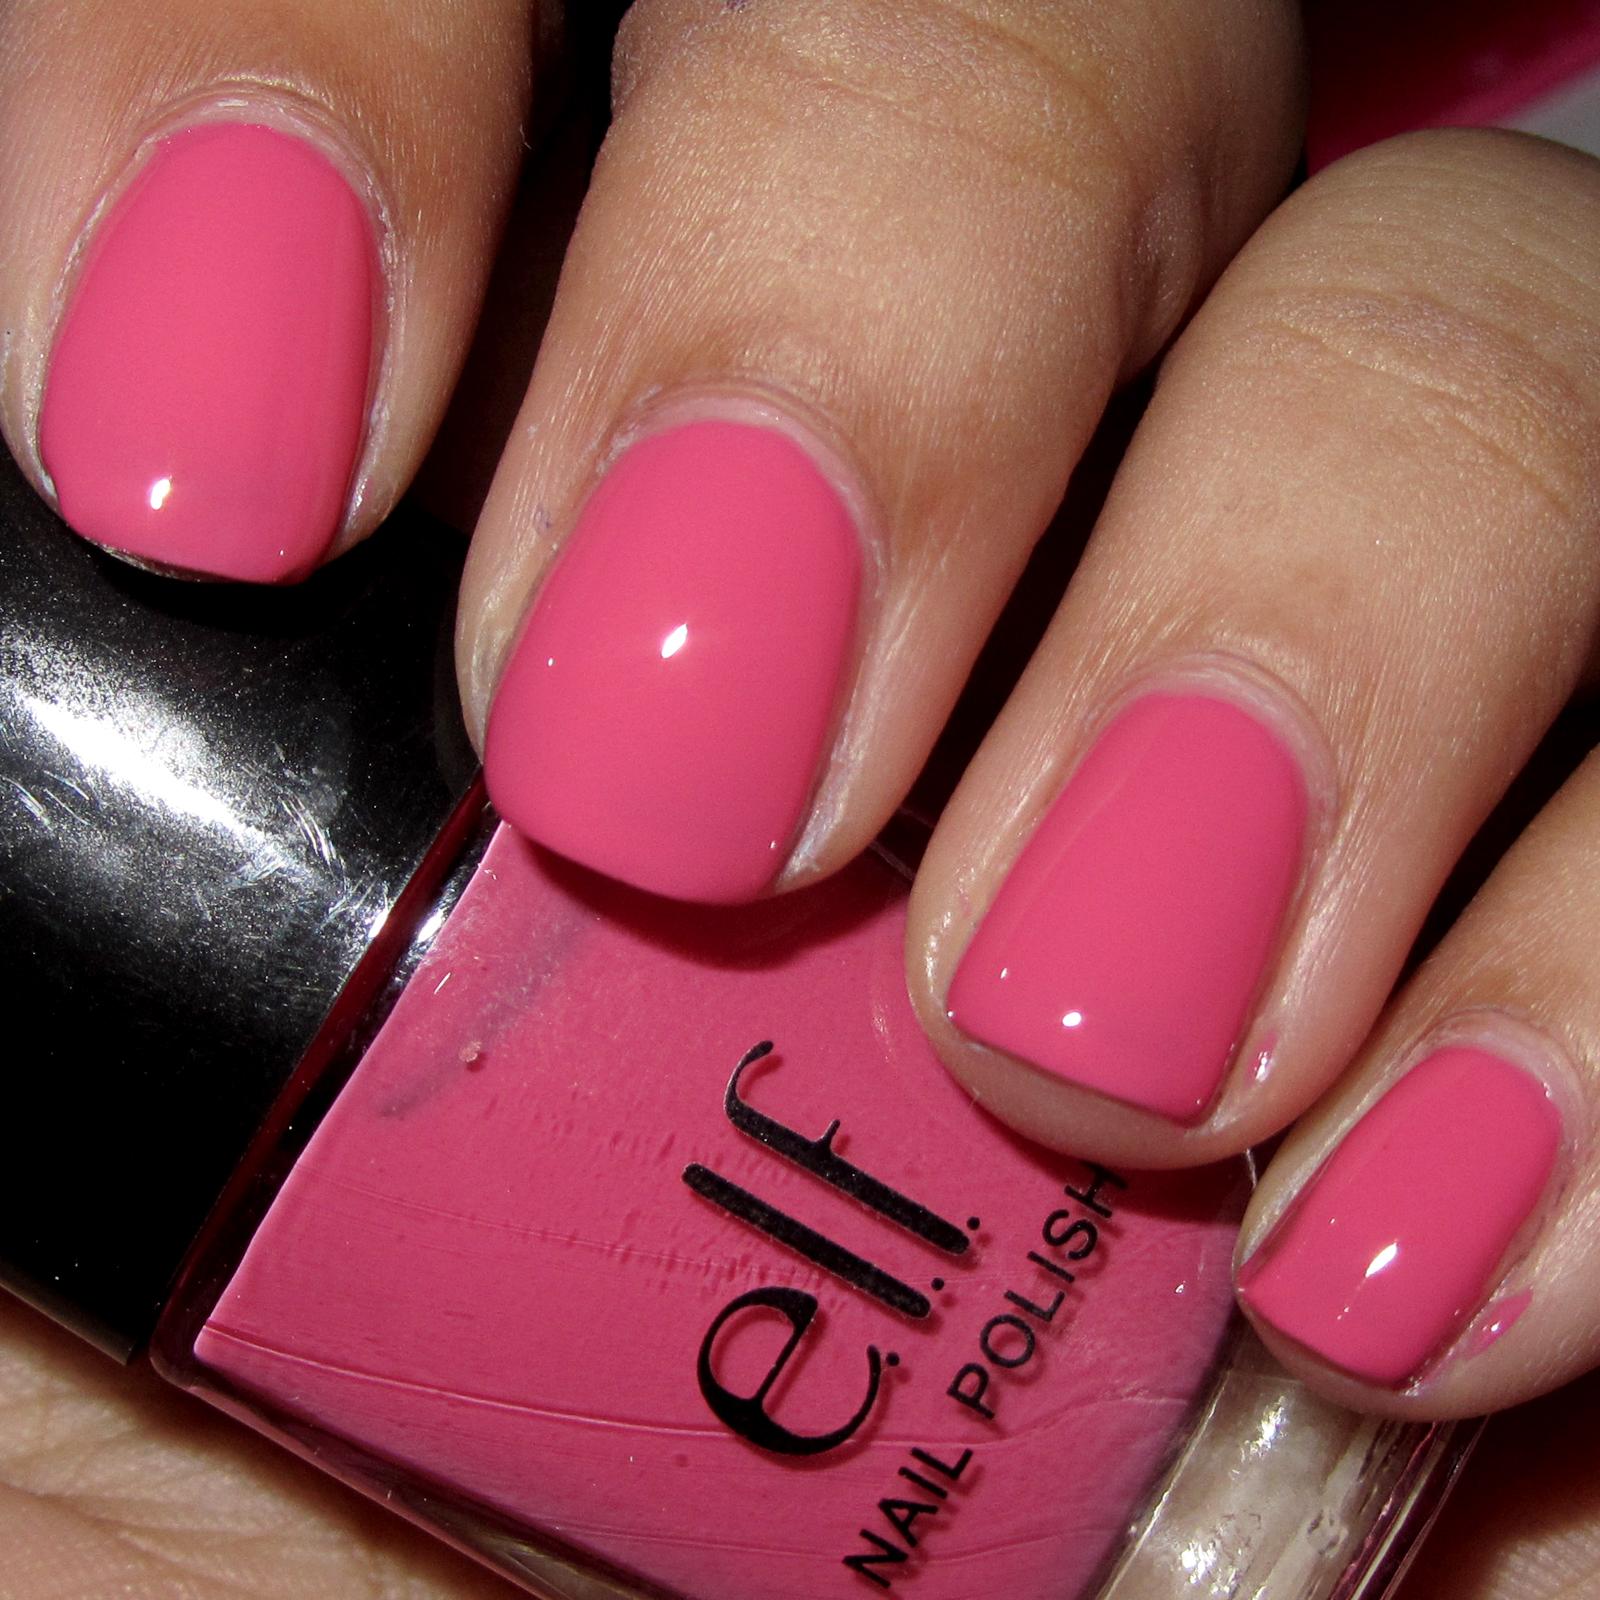 Elf Nail Polish Quality – Papillon Day Spa